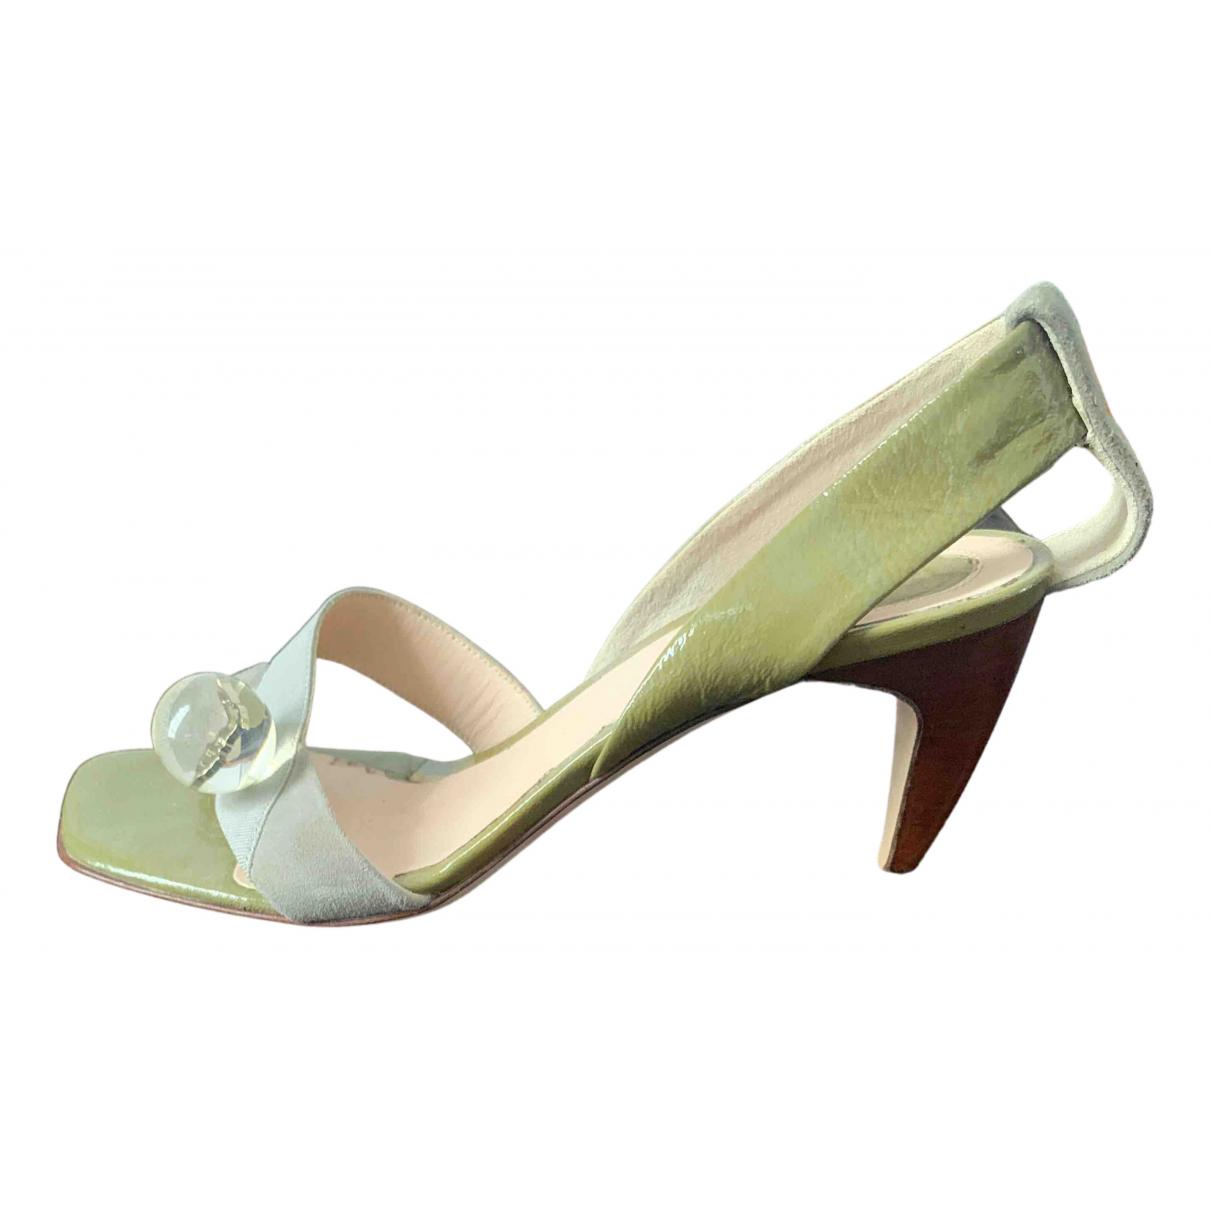 Trussardi N Grey Patent leather Sandals for Women 35 EU